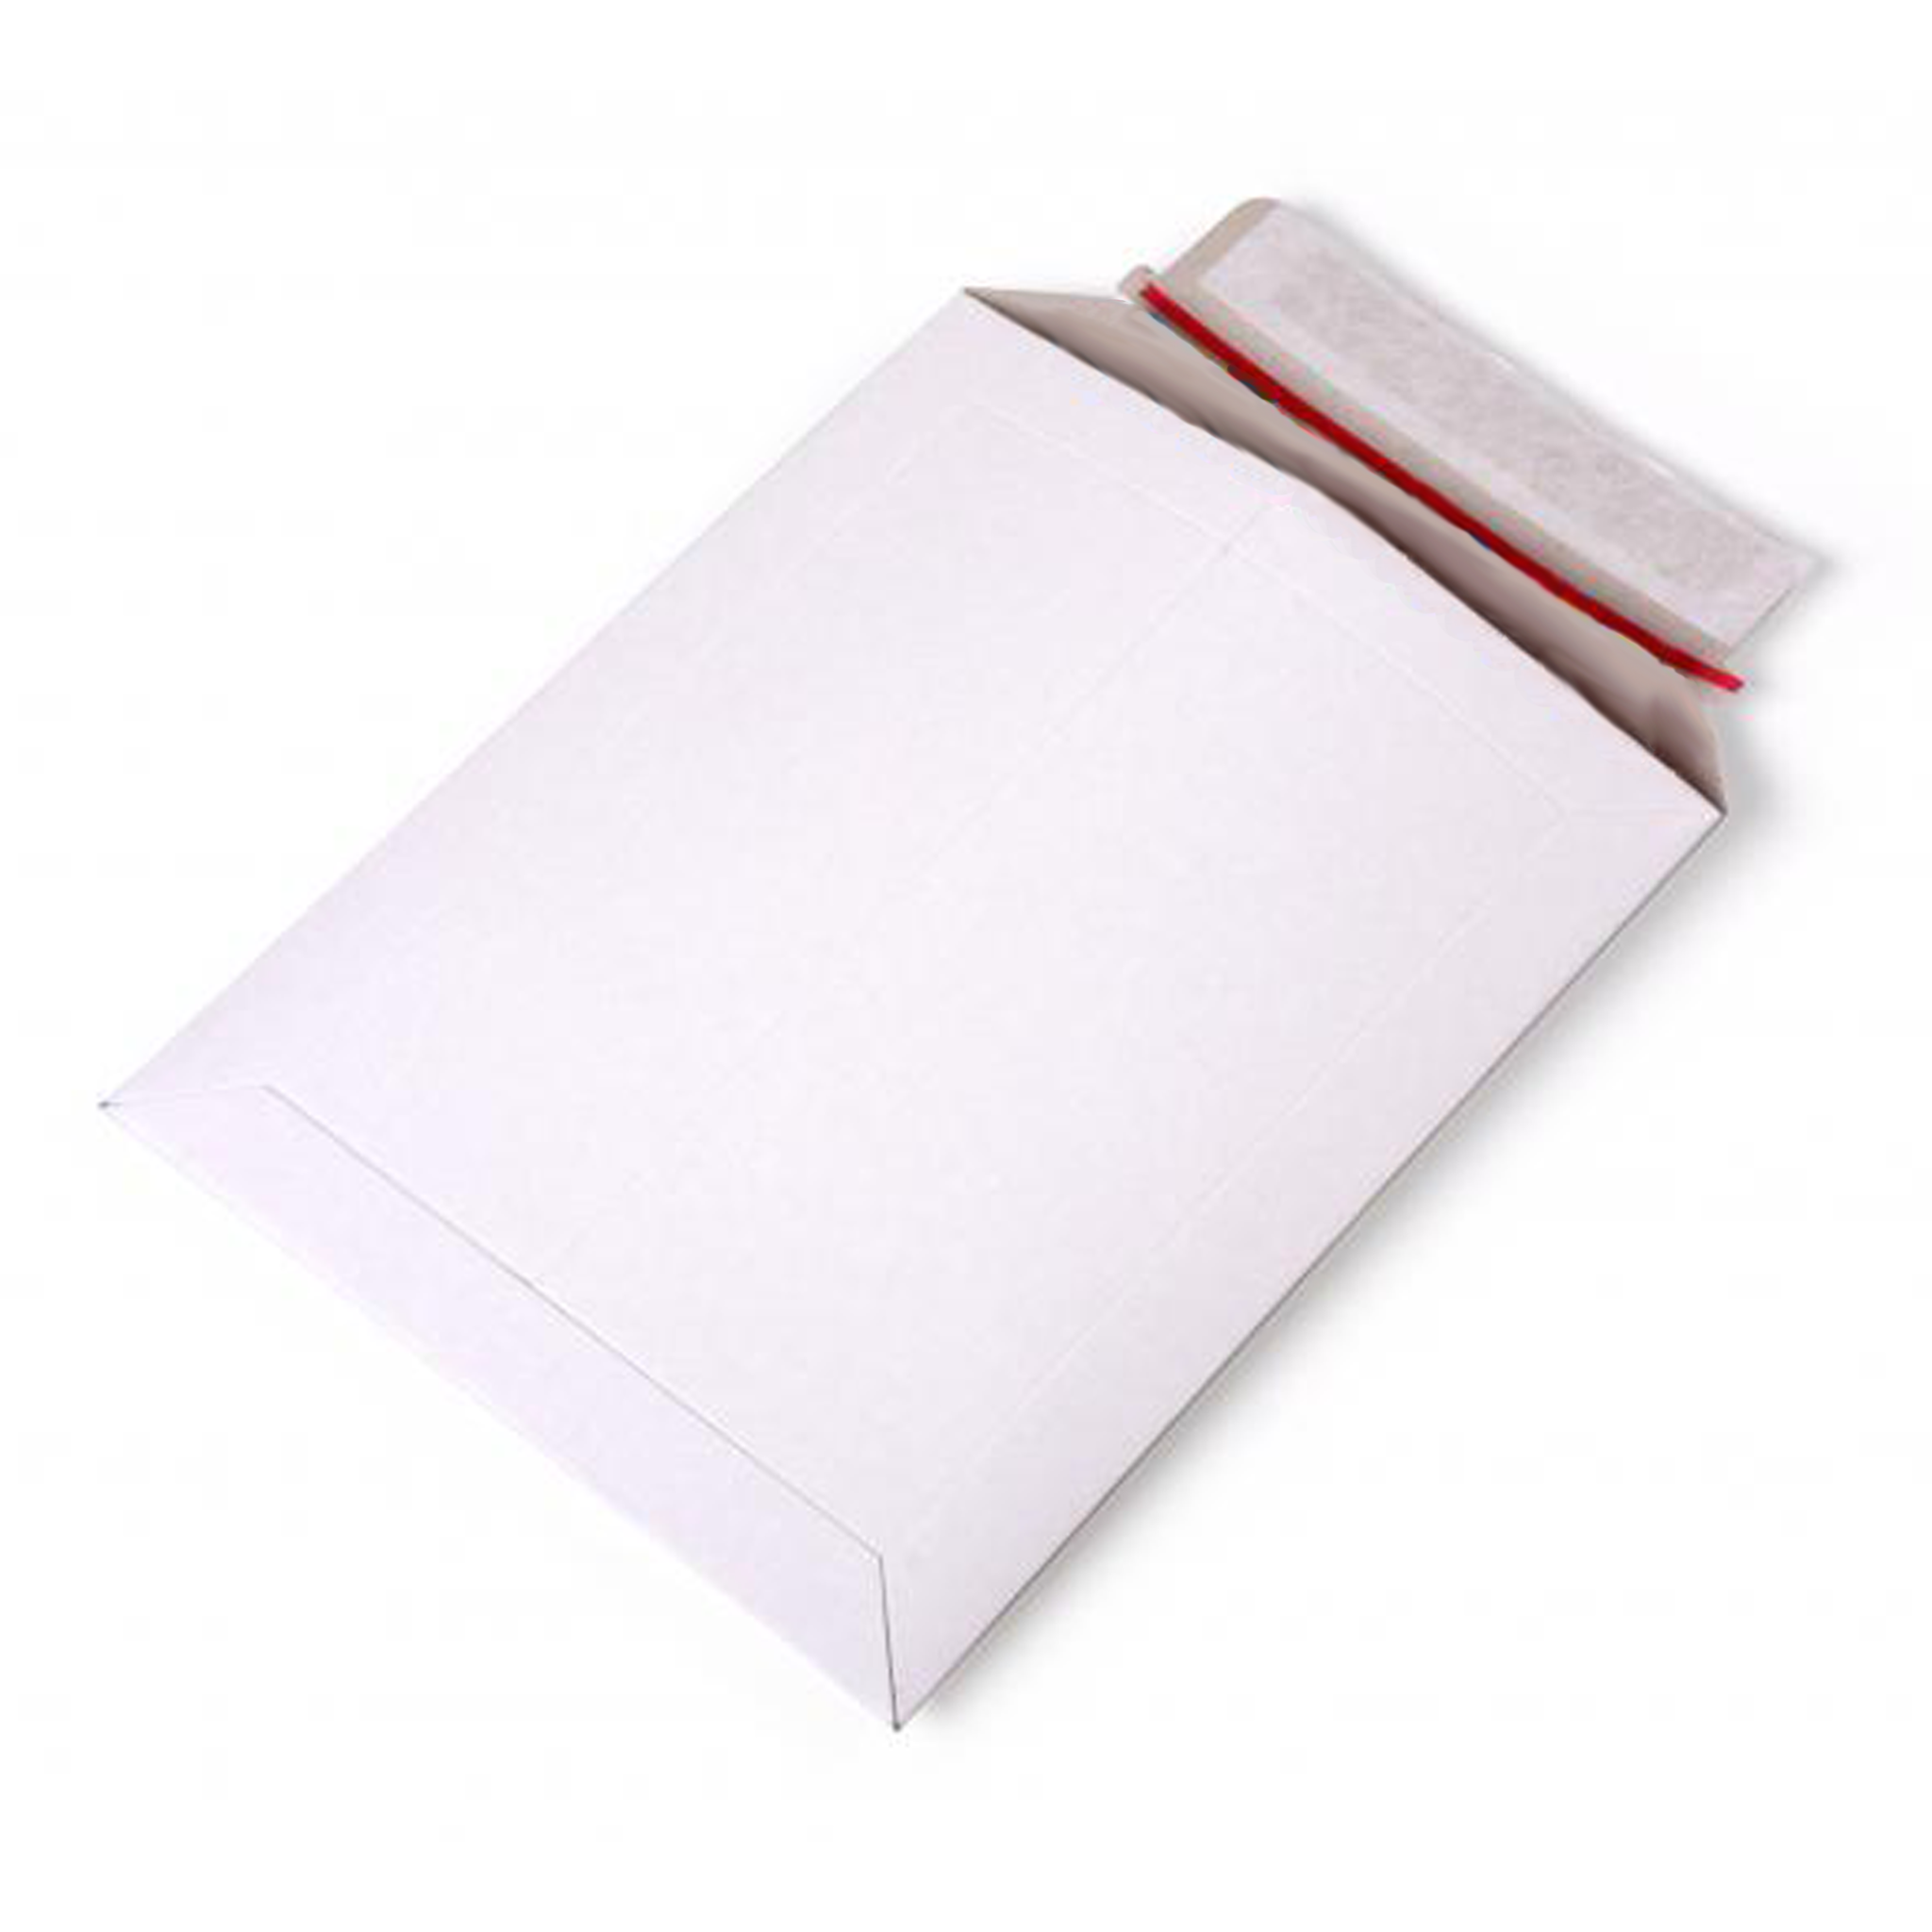 Kartonnen enveloppen 292 x 374 mm pakje van 100 stuks